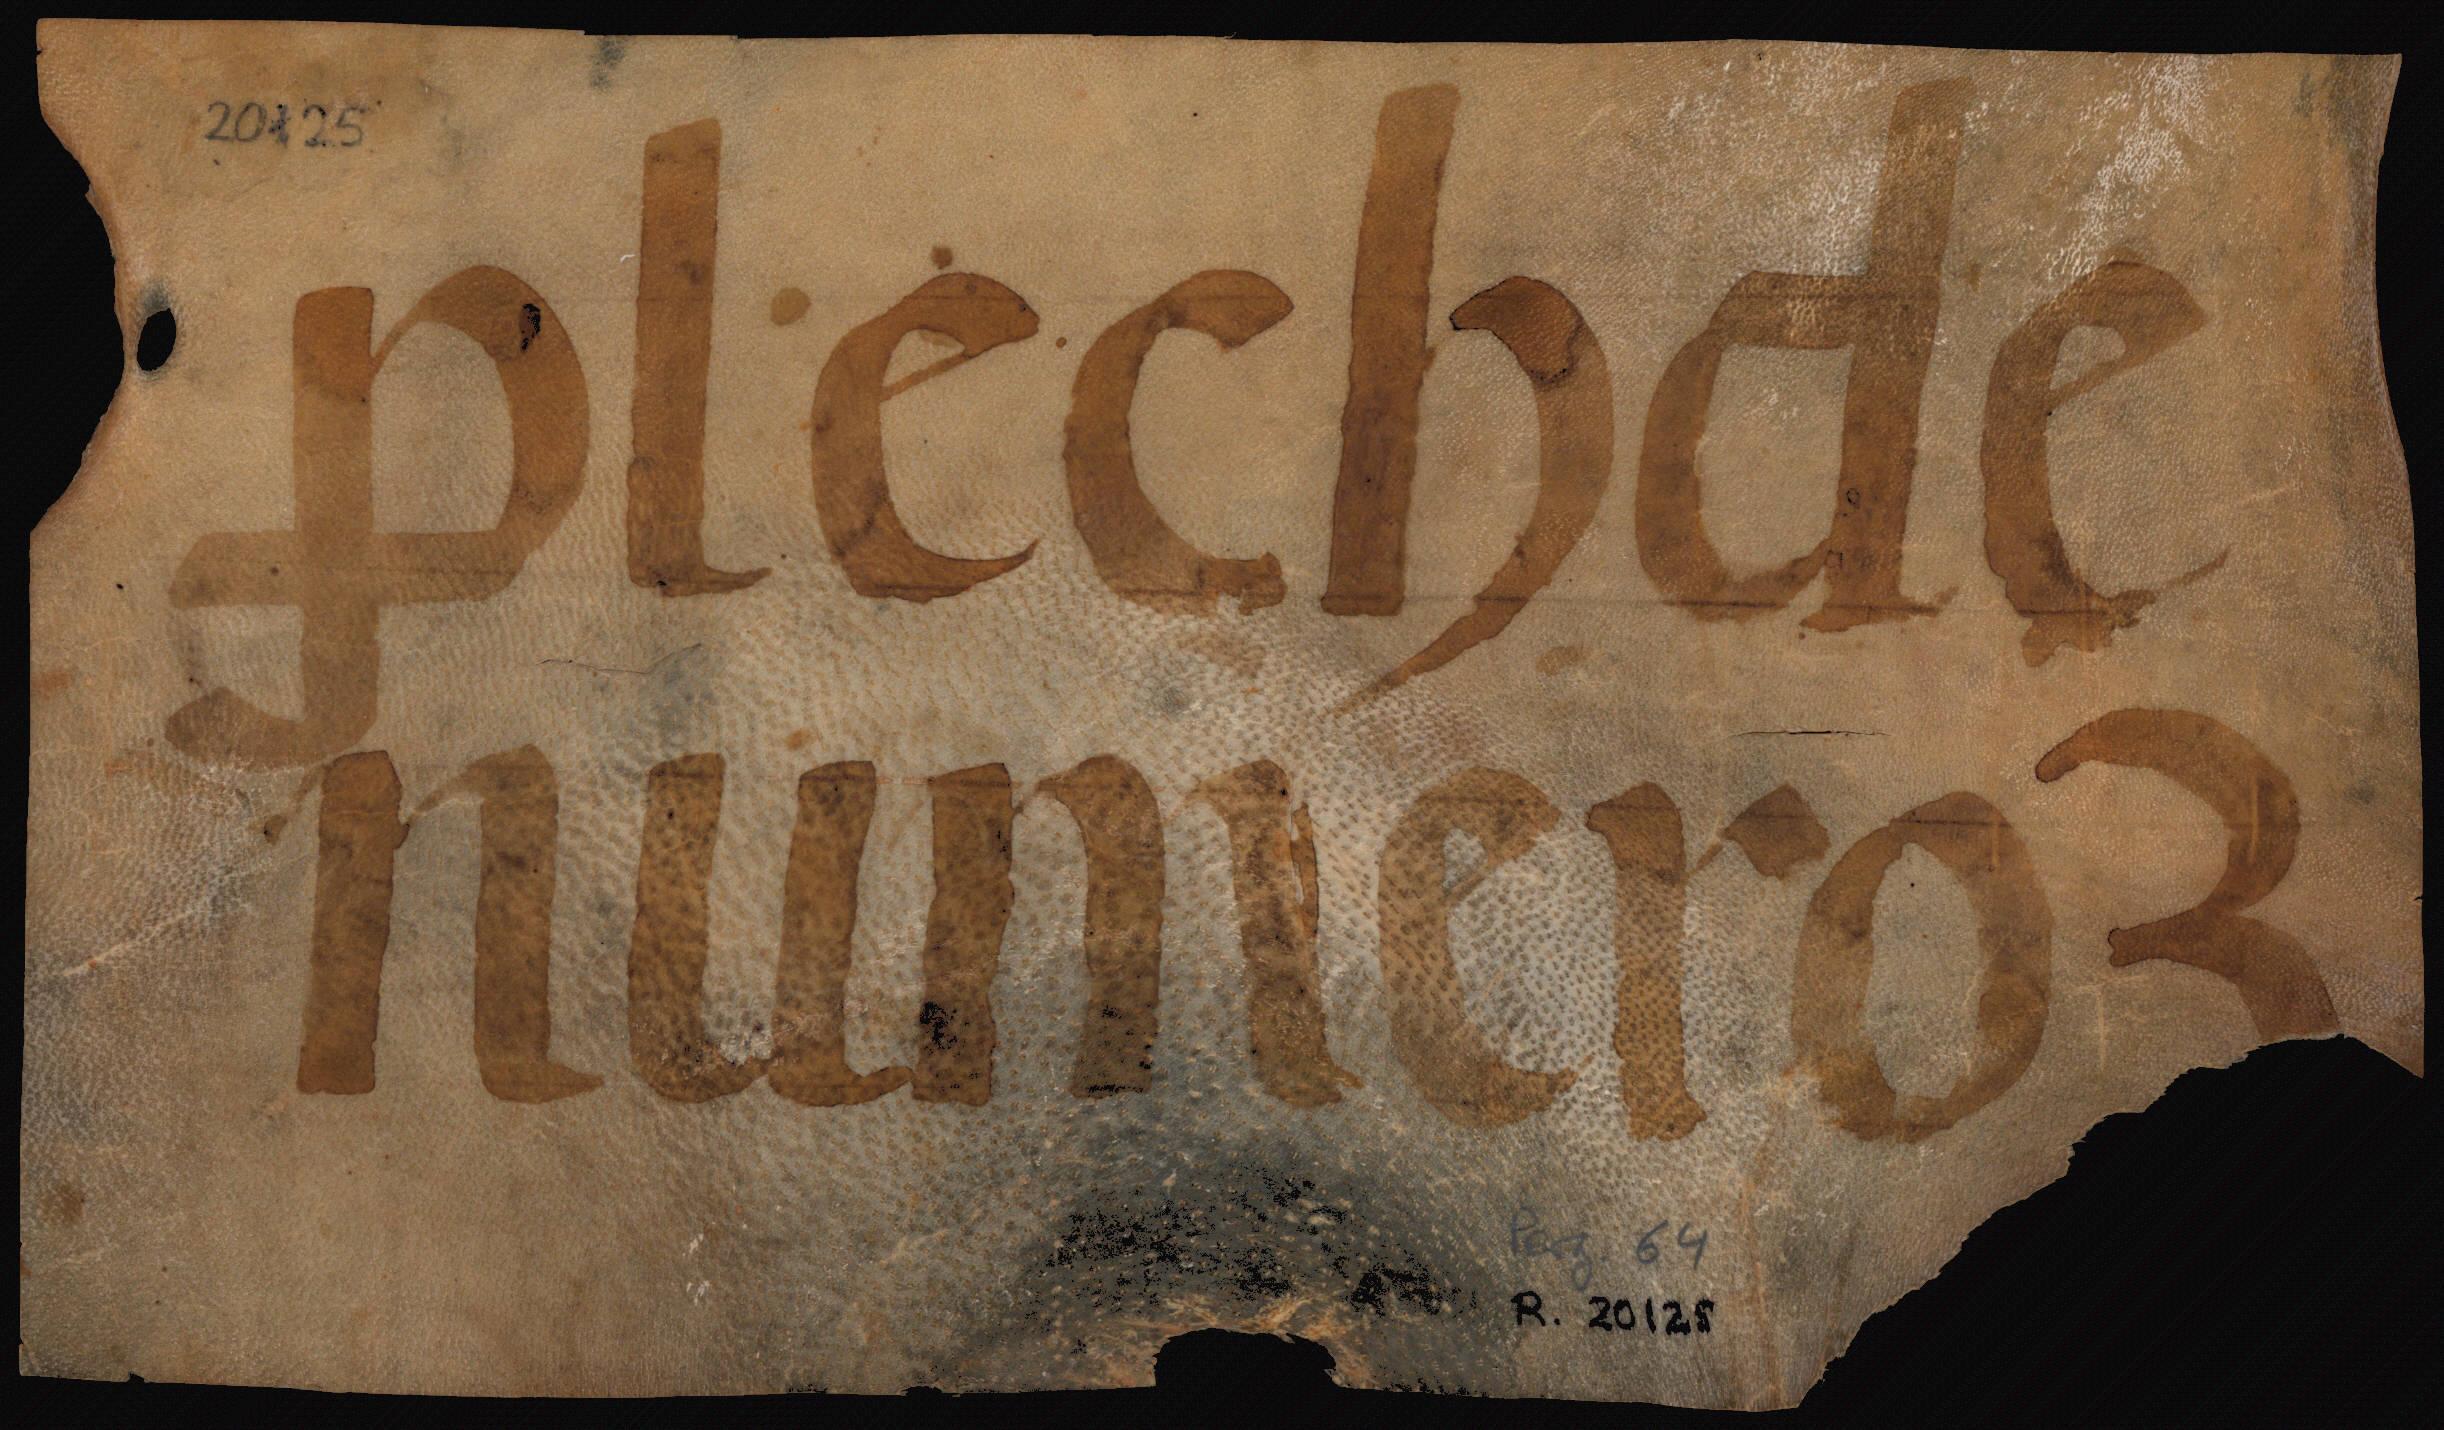 Verso 1450 Vicenç Peçoles